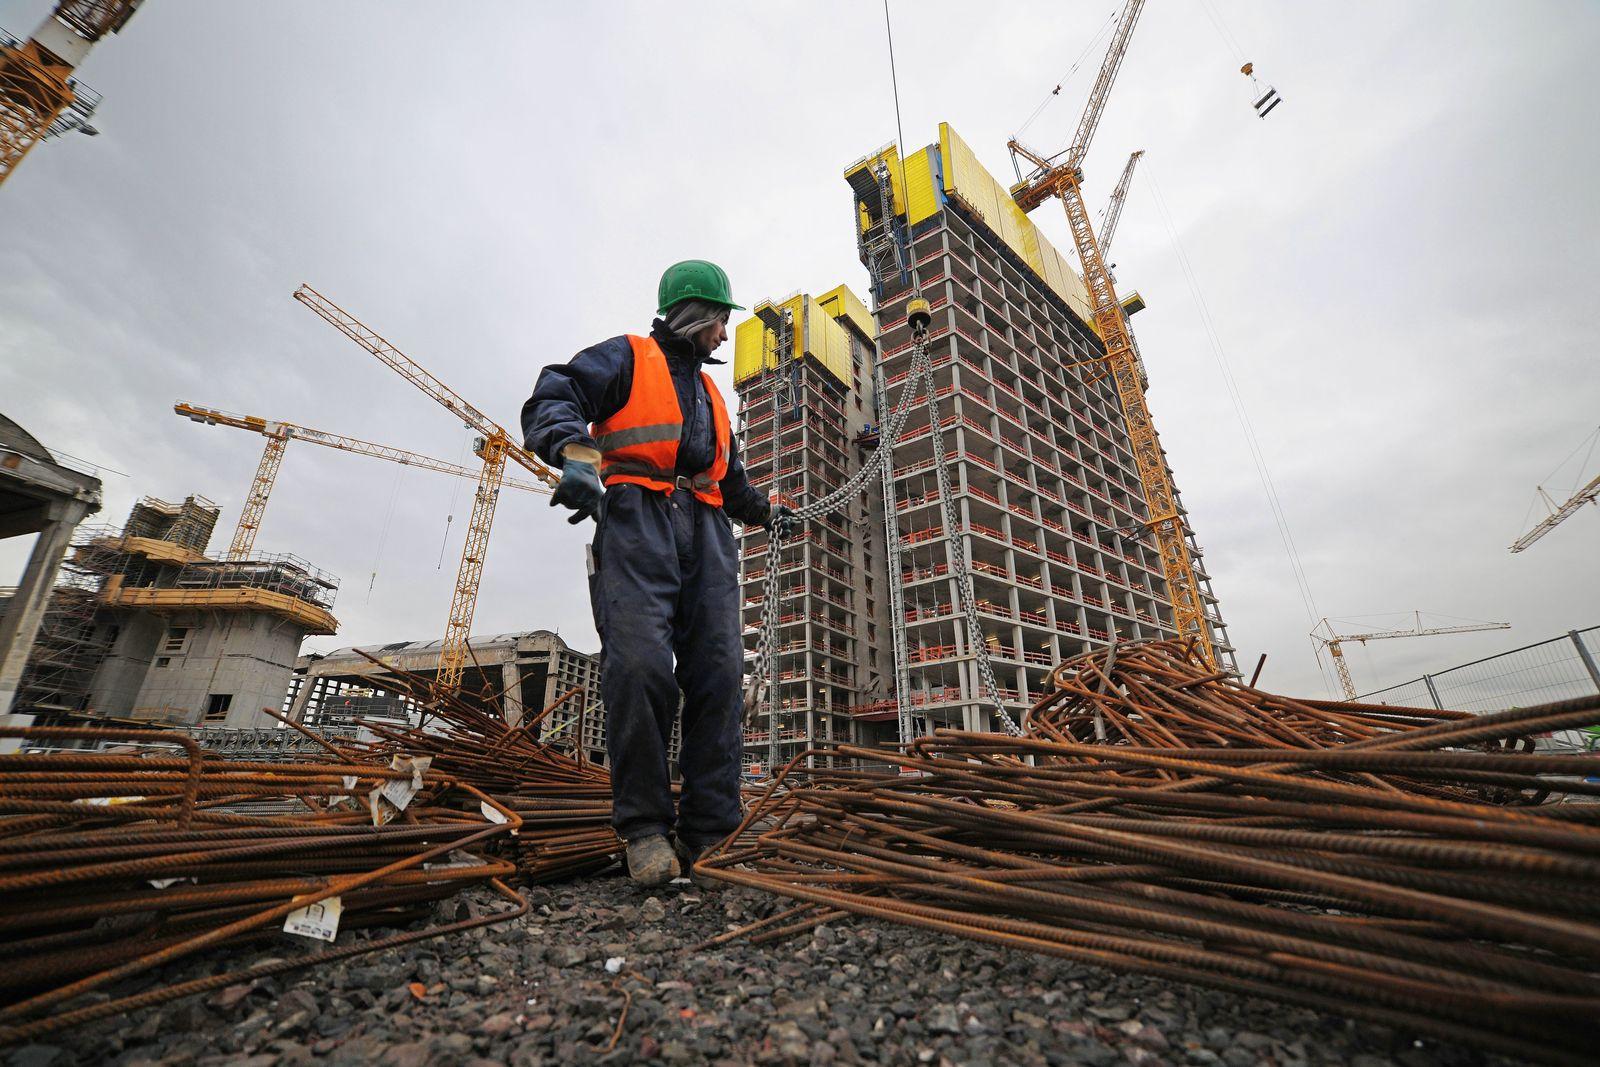 Baustelle/ Bauarbeiter/ Konjunktur